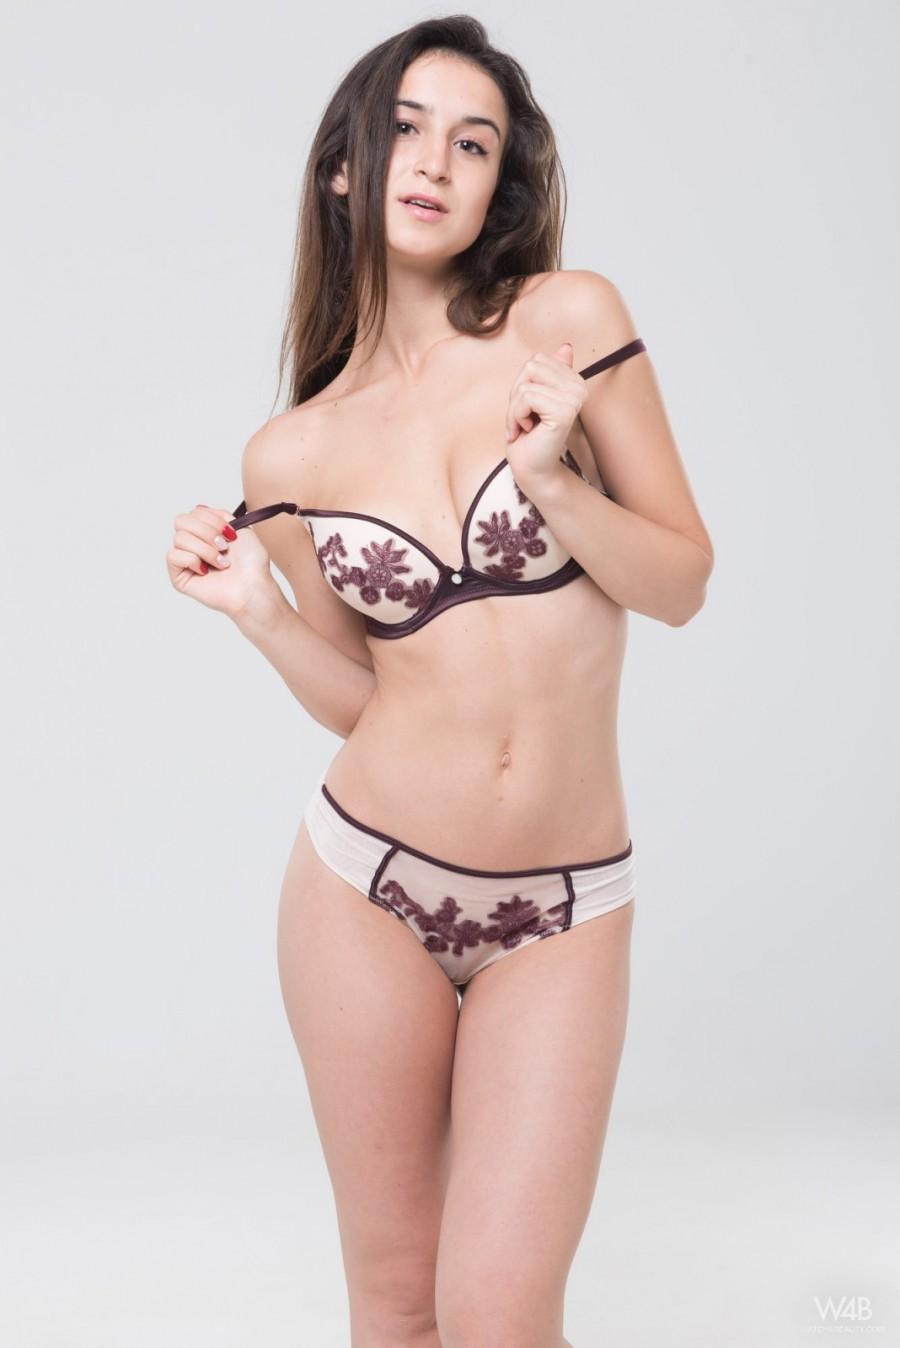 Casting Erotic Galleries - Pure Nude Girls